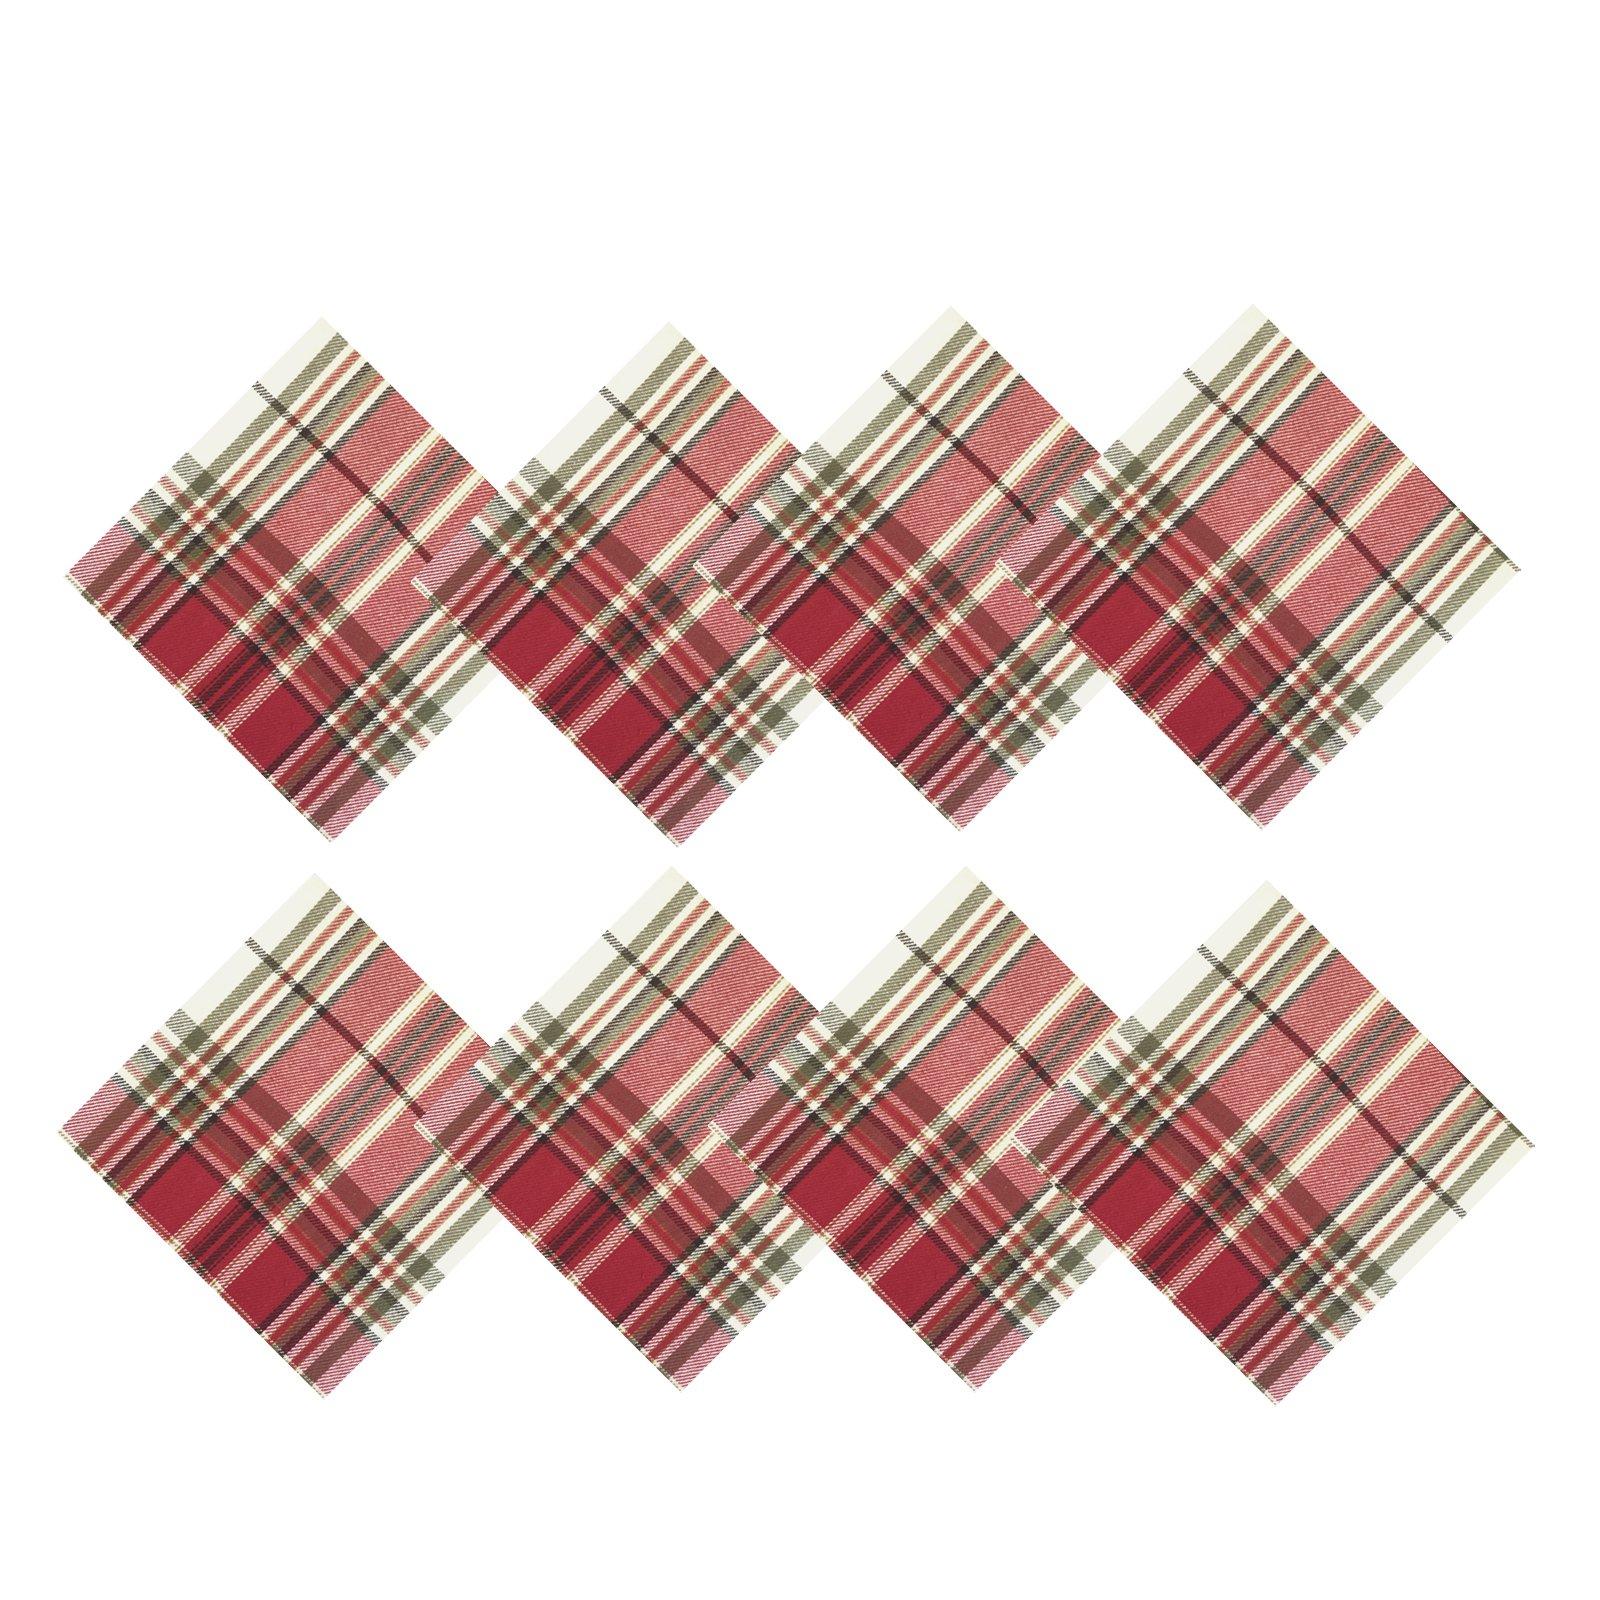 Sully Tartan Christmas Plaid Fabric Napkins, 100% Woven Cotton Holiday Napkin Set, Set of 8 Napkins